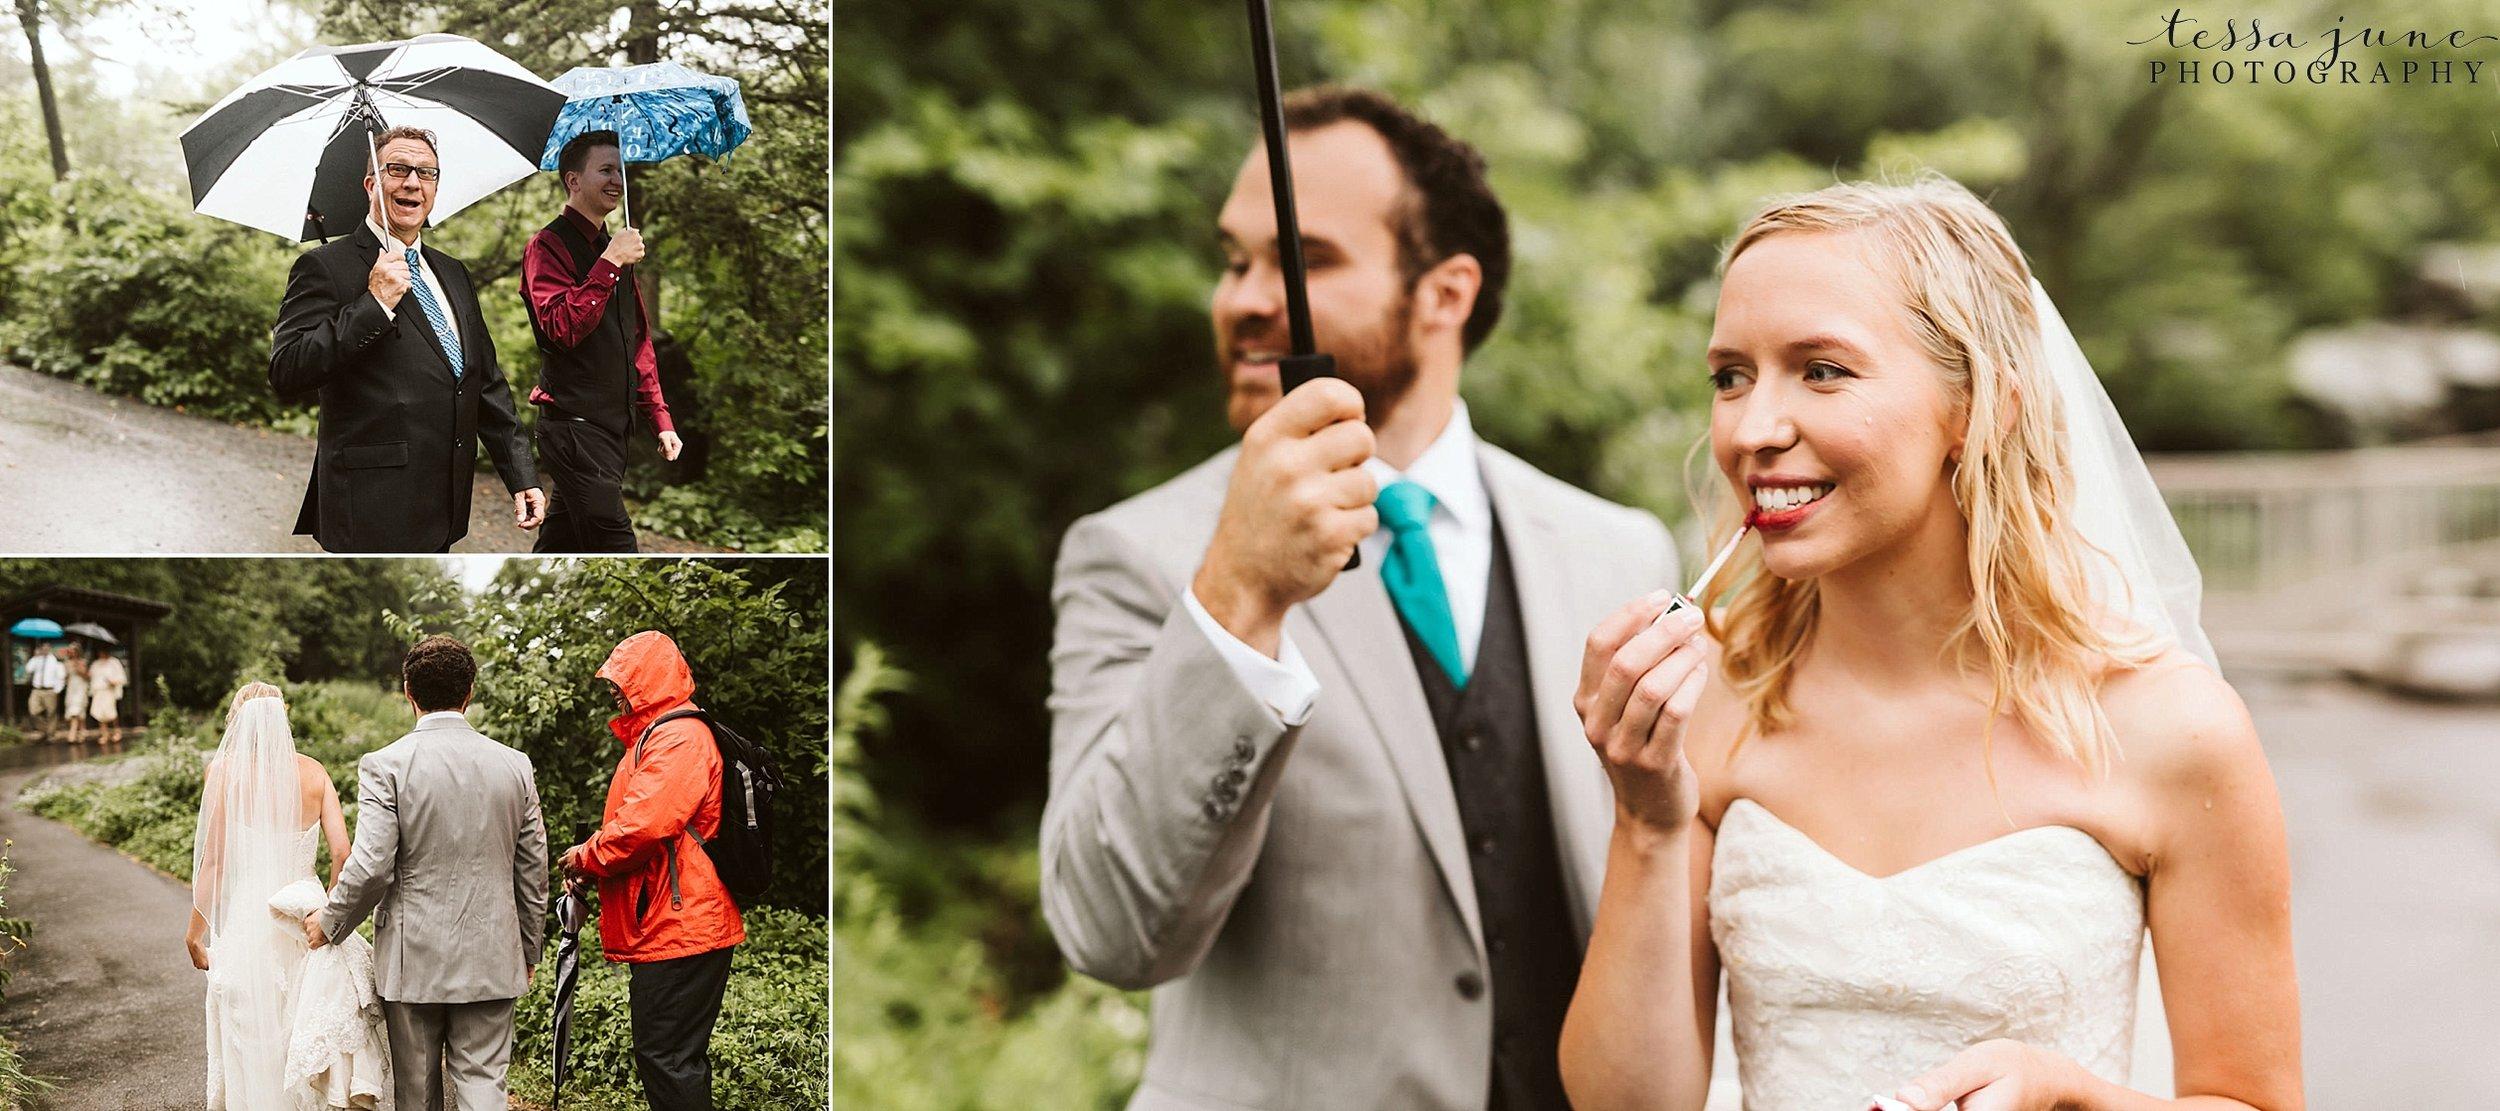 taylors-falls-rainy-elopement-wedding-interstate-state-park-34.jpg